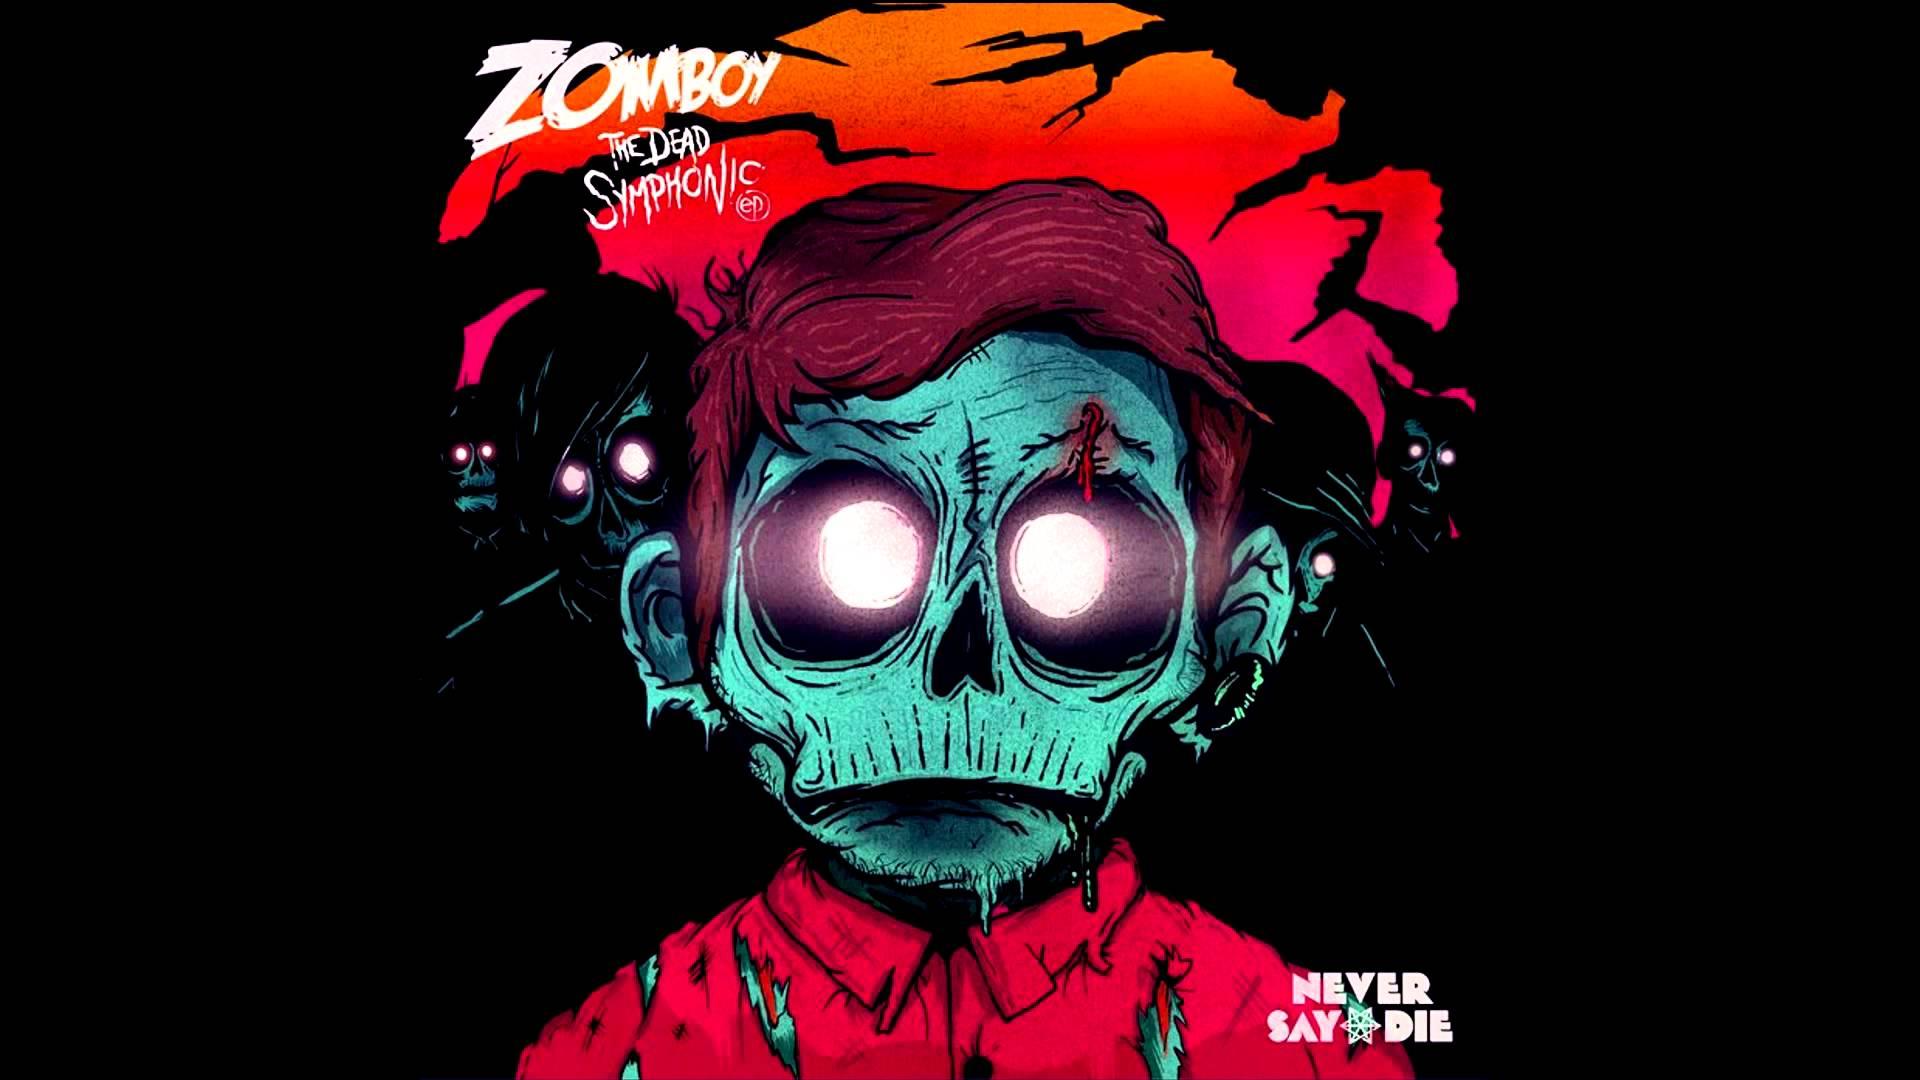 Wallpaper iphone zomboy - Zomboy The Dead Symphonic Ep 02 Hoedown Hd Youtube